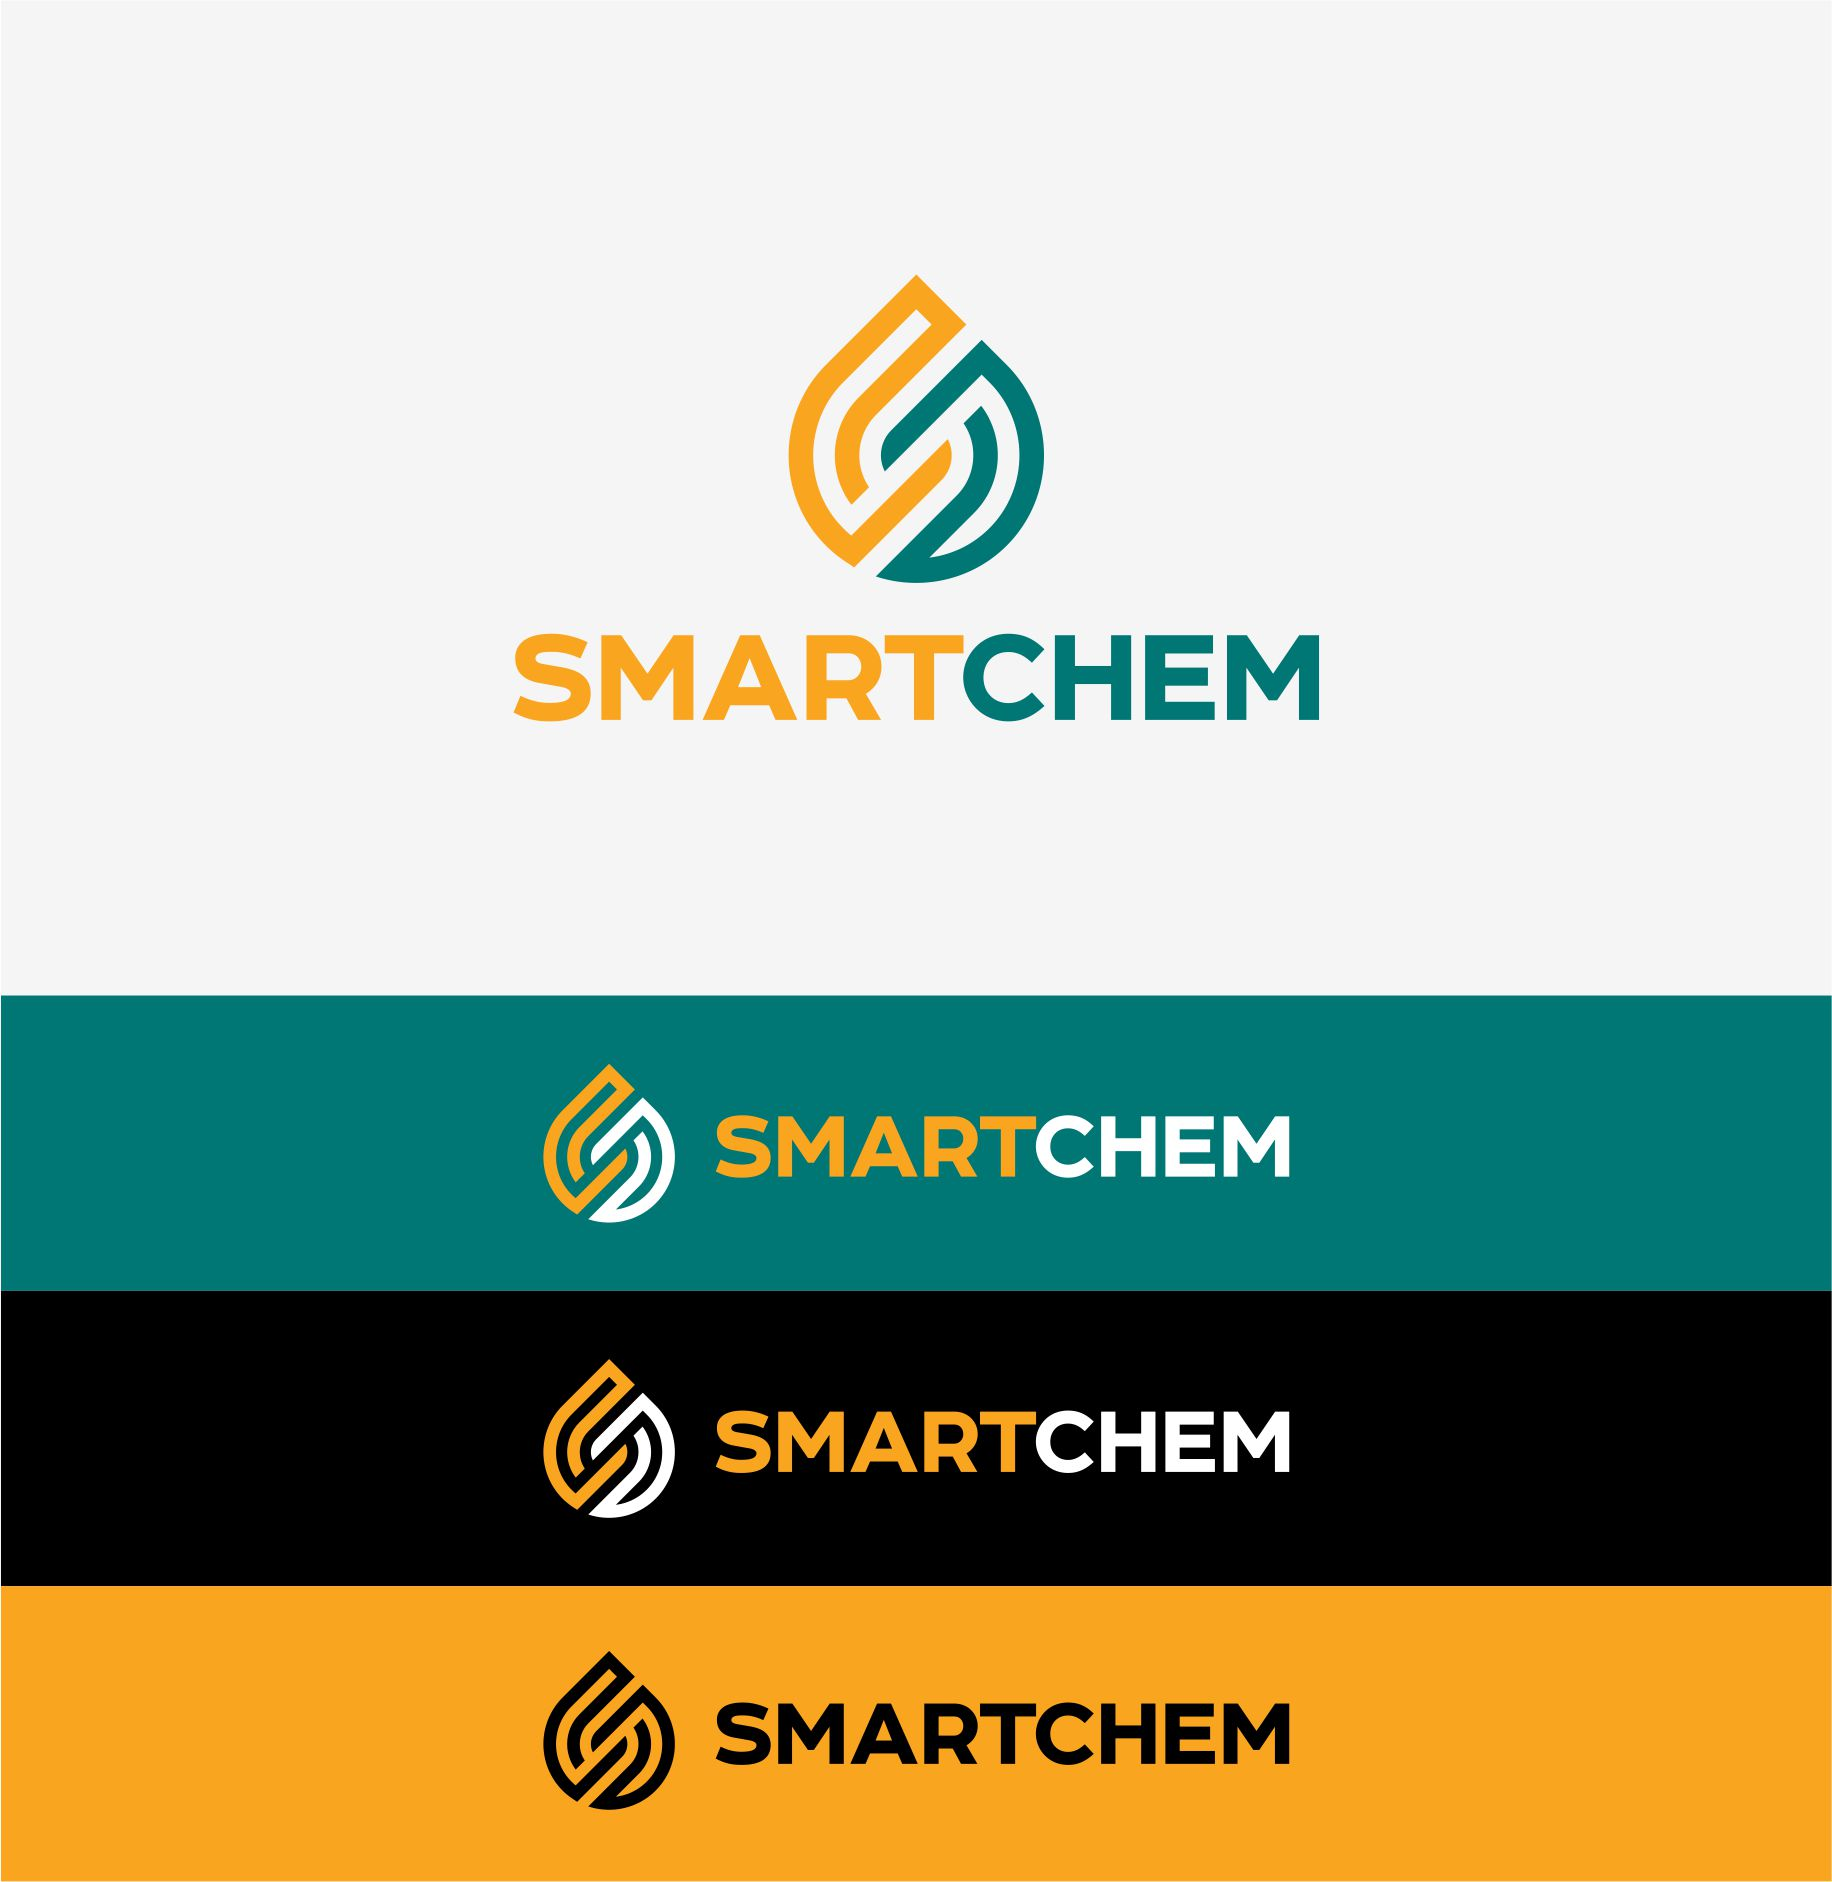 Логотип для компании фото f_5275a86e45a6b725.jpg